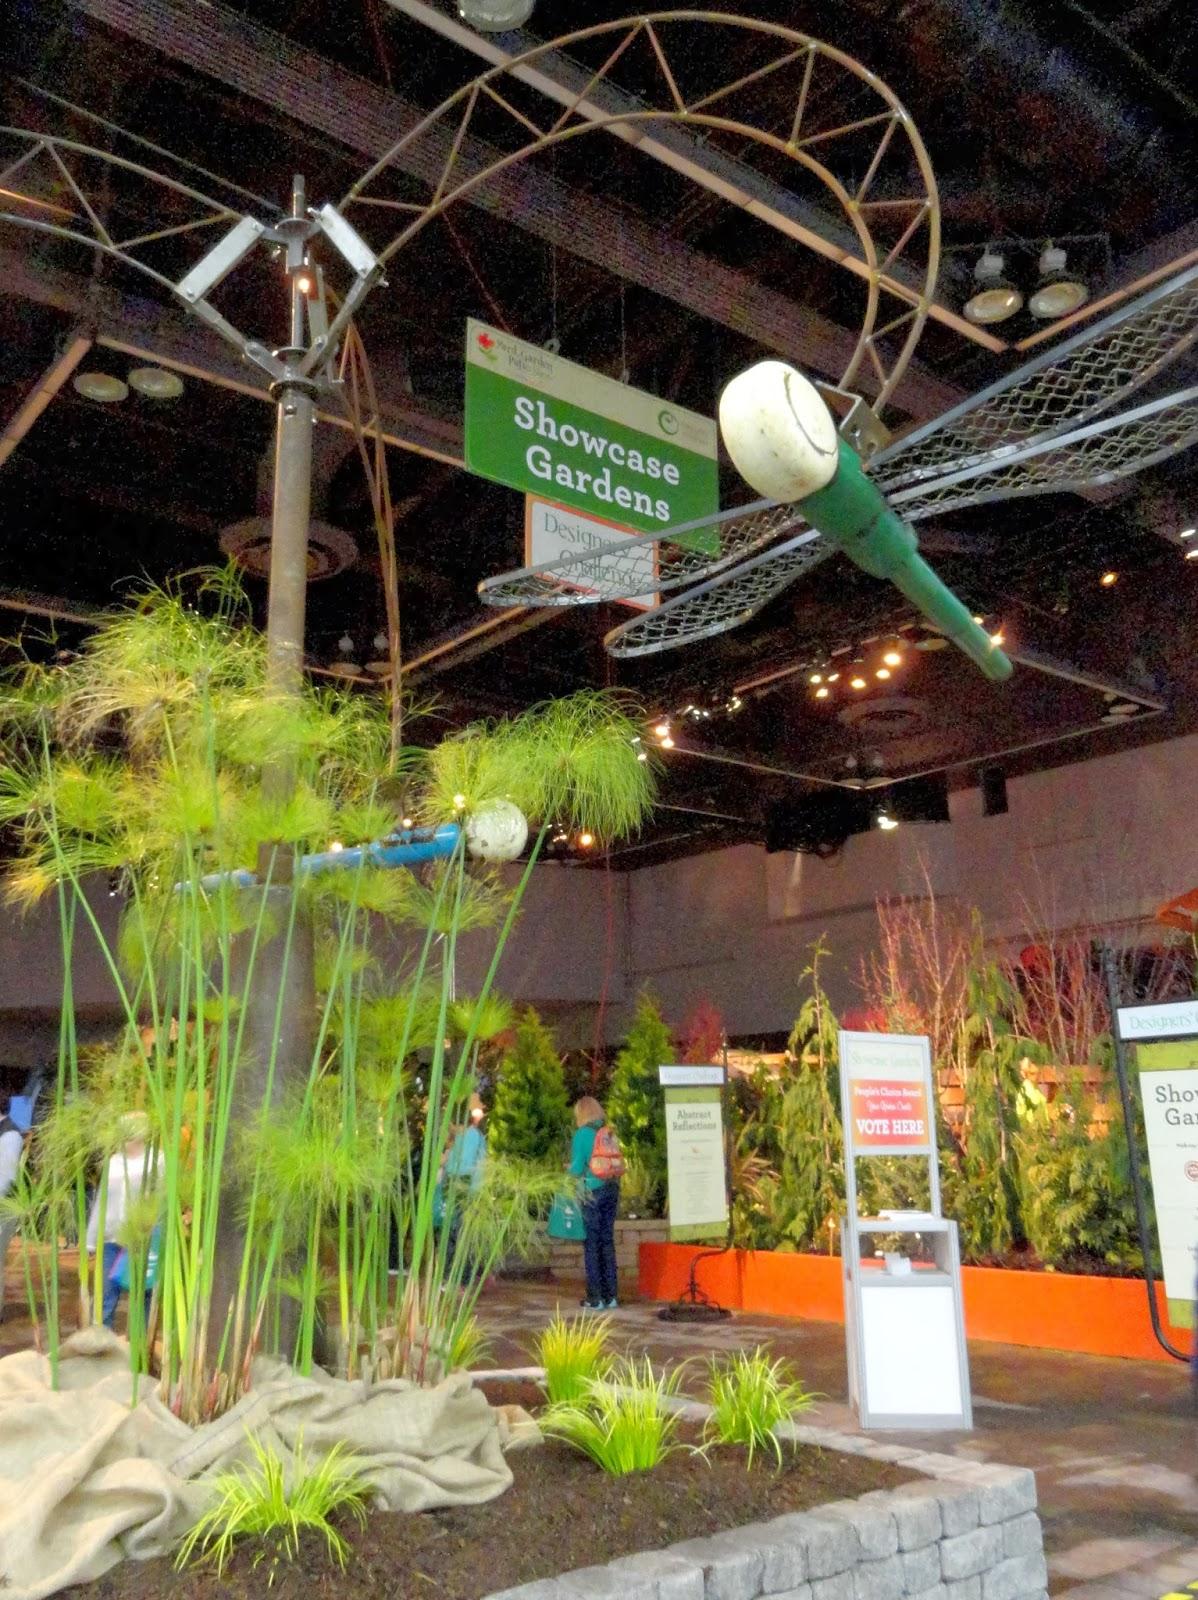 2014 Yard, Garden U0026 Patio Show, The Showcase Gardens.